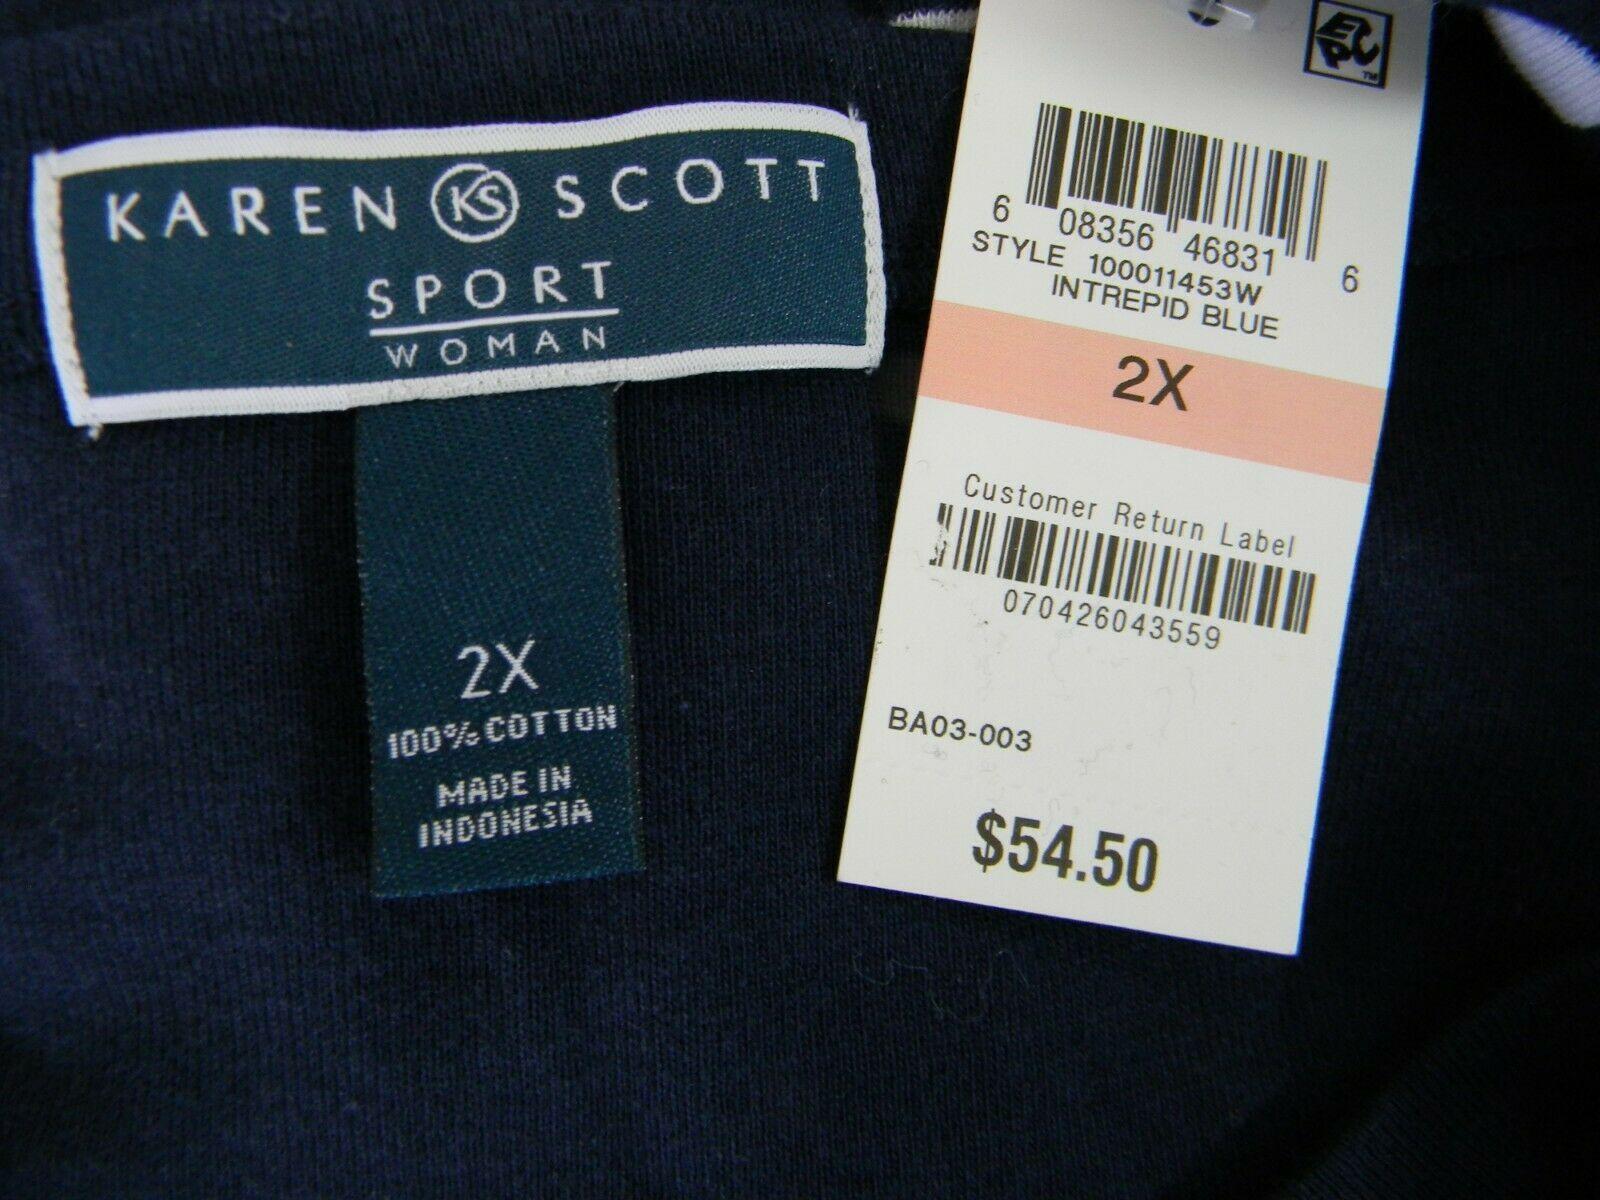 Karen Scott Plus Size 2X,3X Dress Floral Embroidered Striped Shift Dress NEW $54 image 10